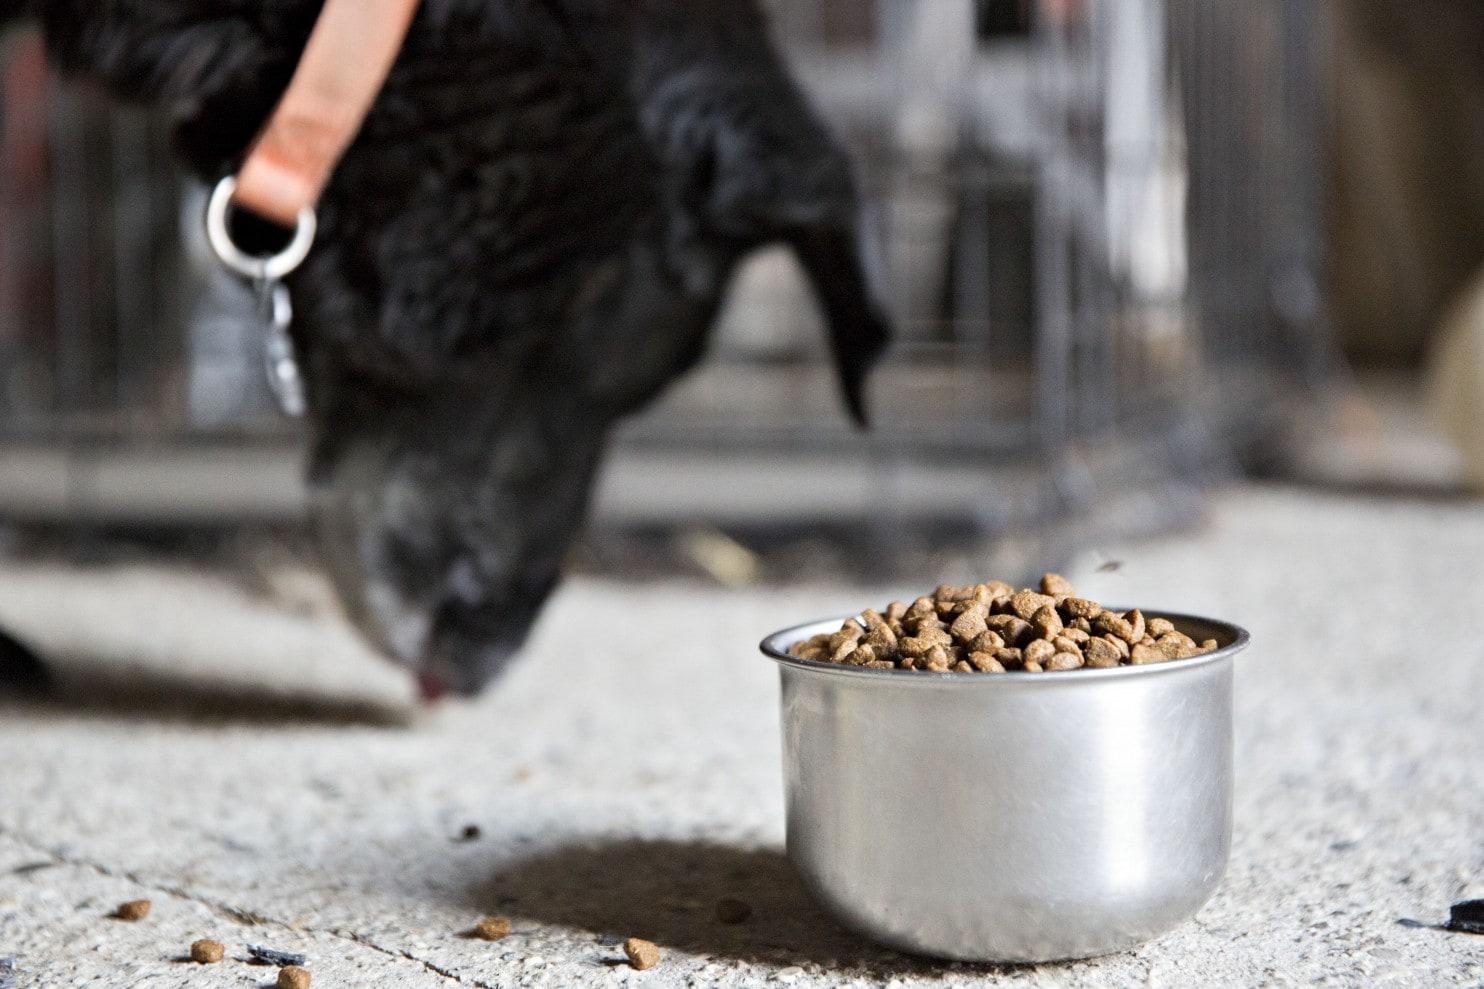 Dog eating 'dog food'